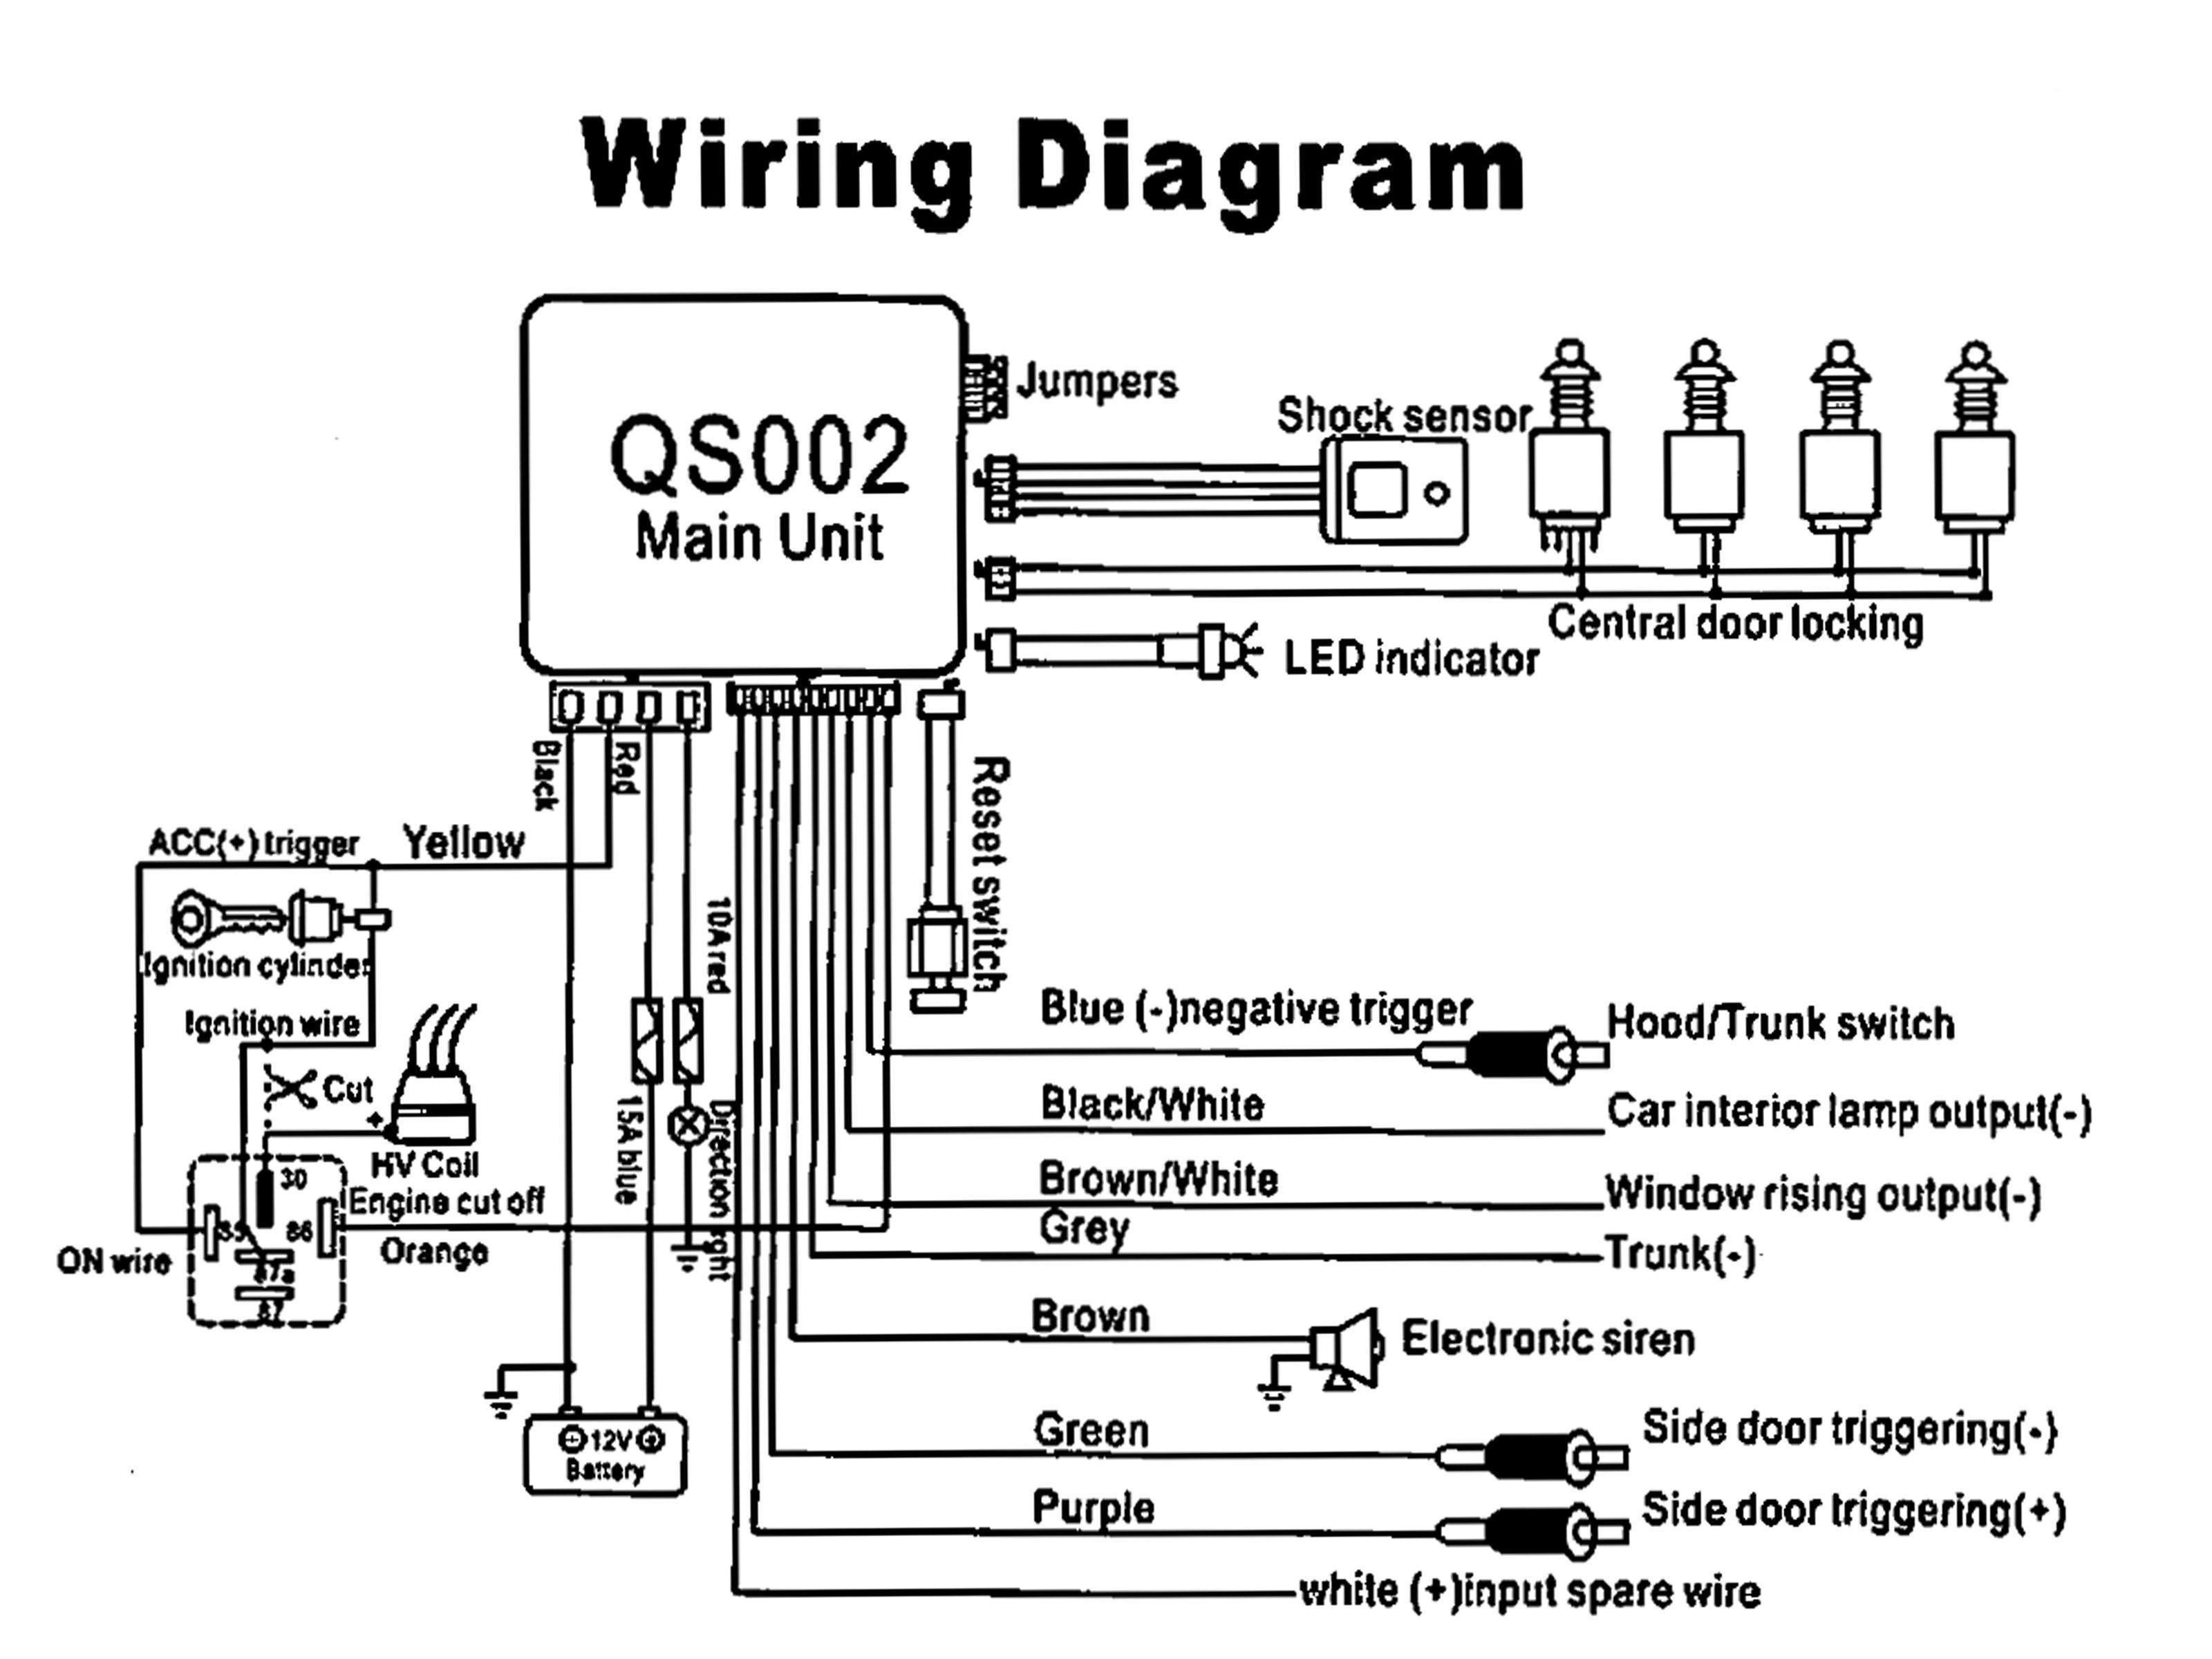 5706 Viper Alarm Wiring Diagram Car Alarm Wiring Of 5706 Viper Alarm Wiring Diagram